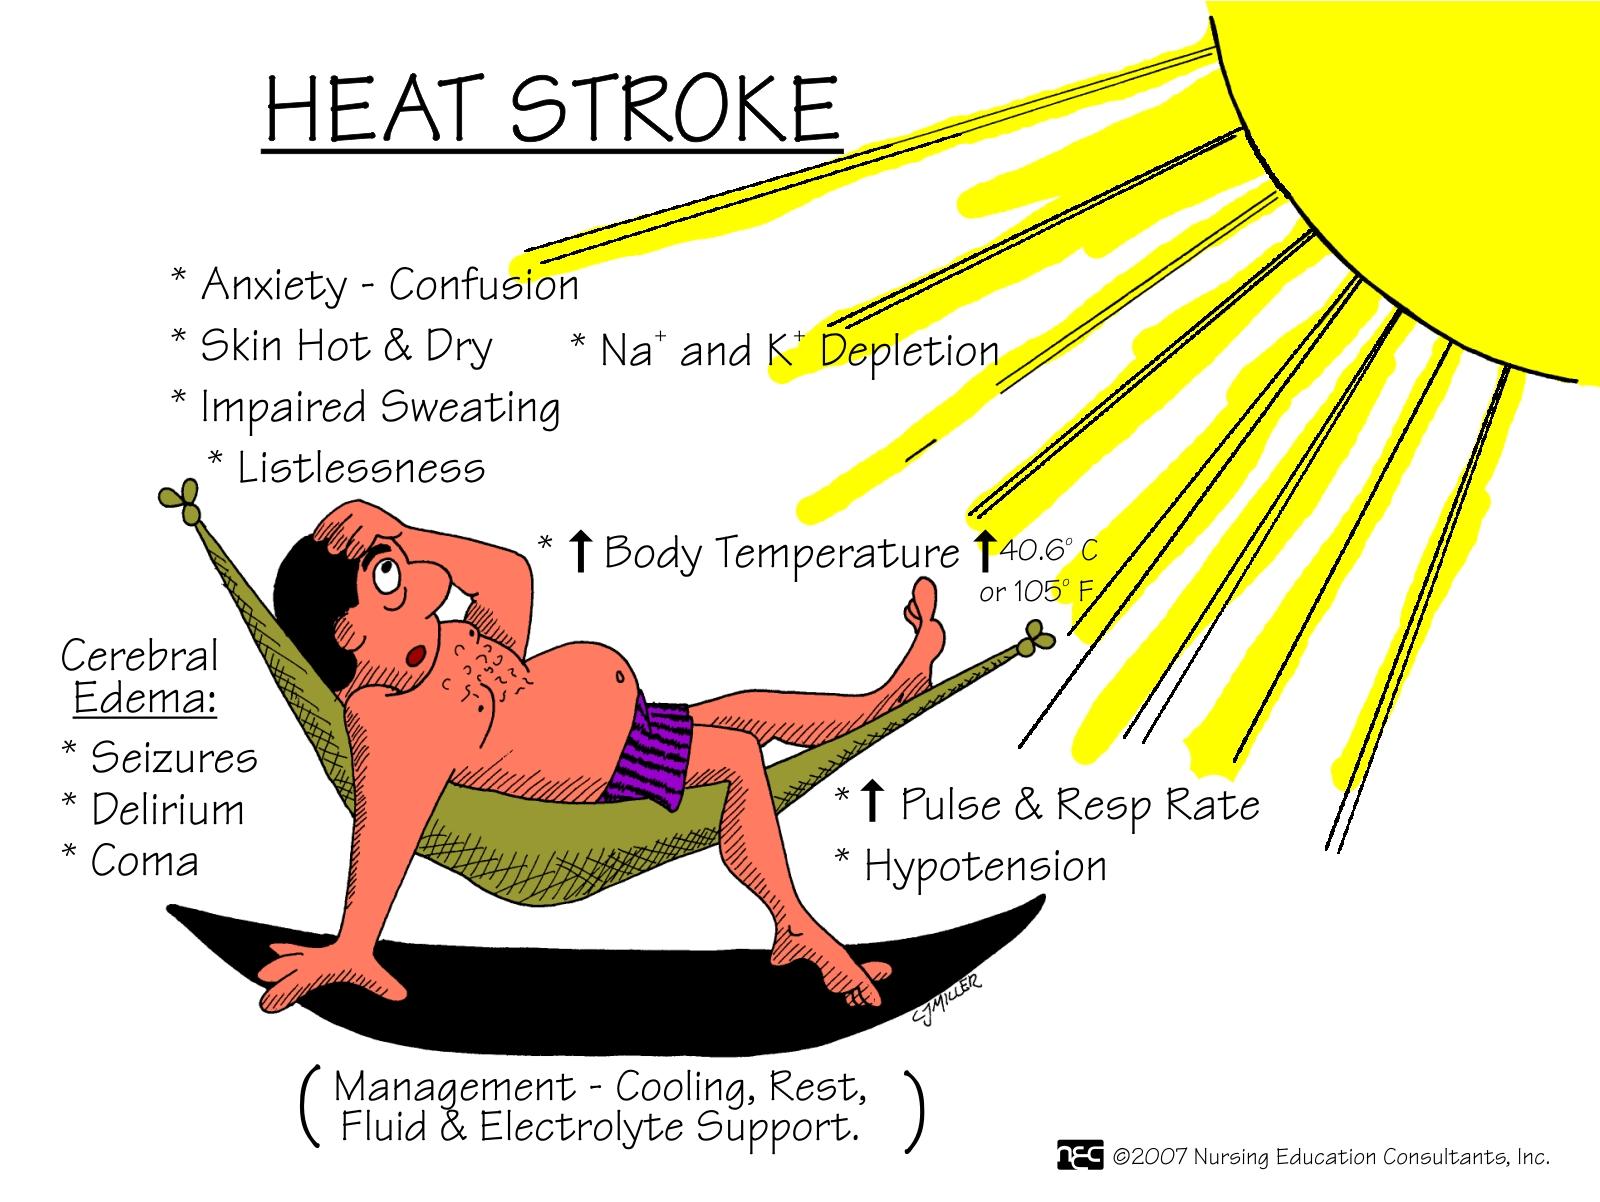 Several tips to avoid heat stroke